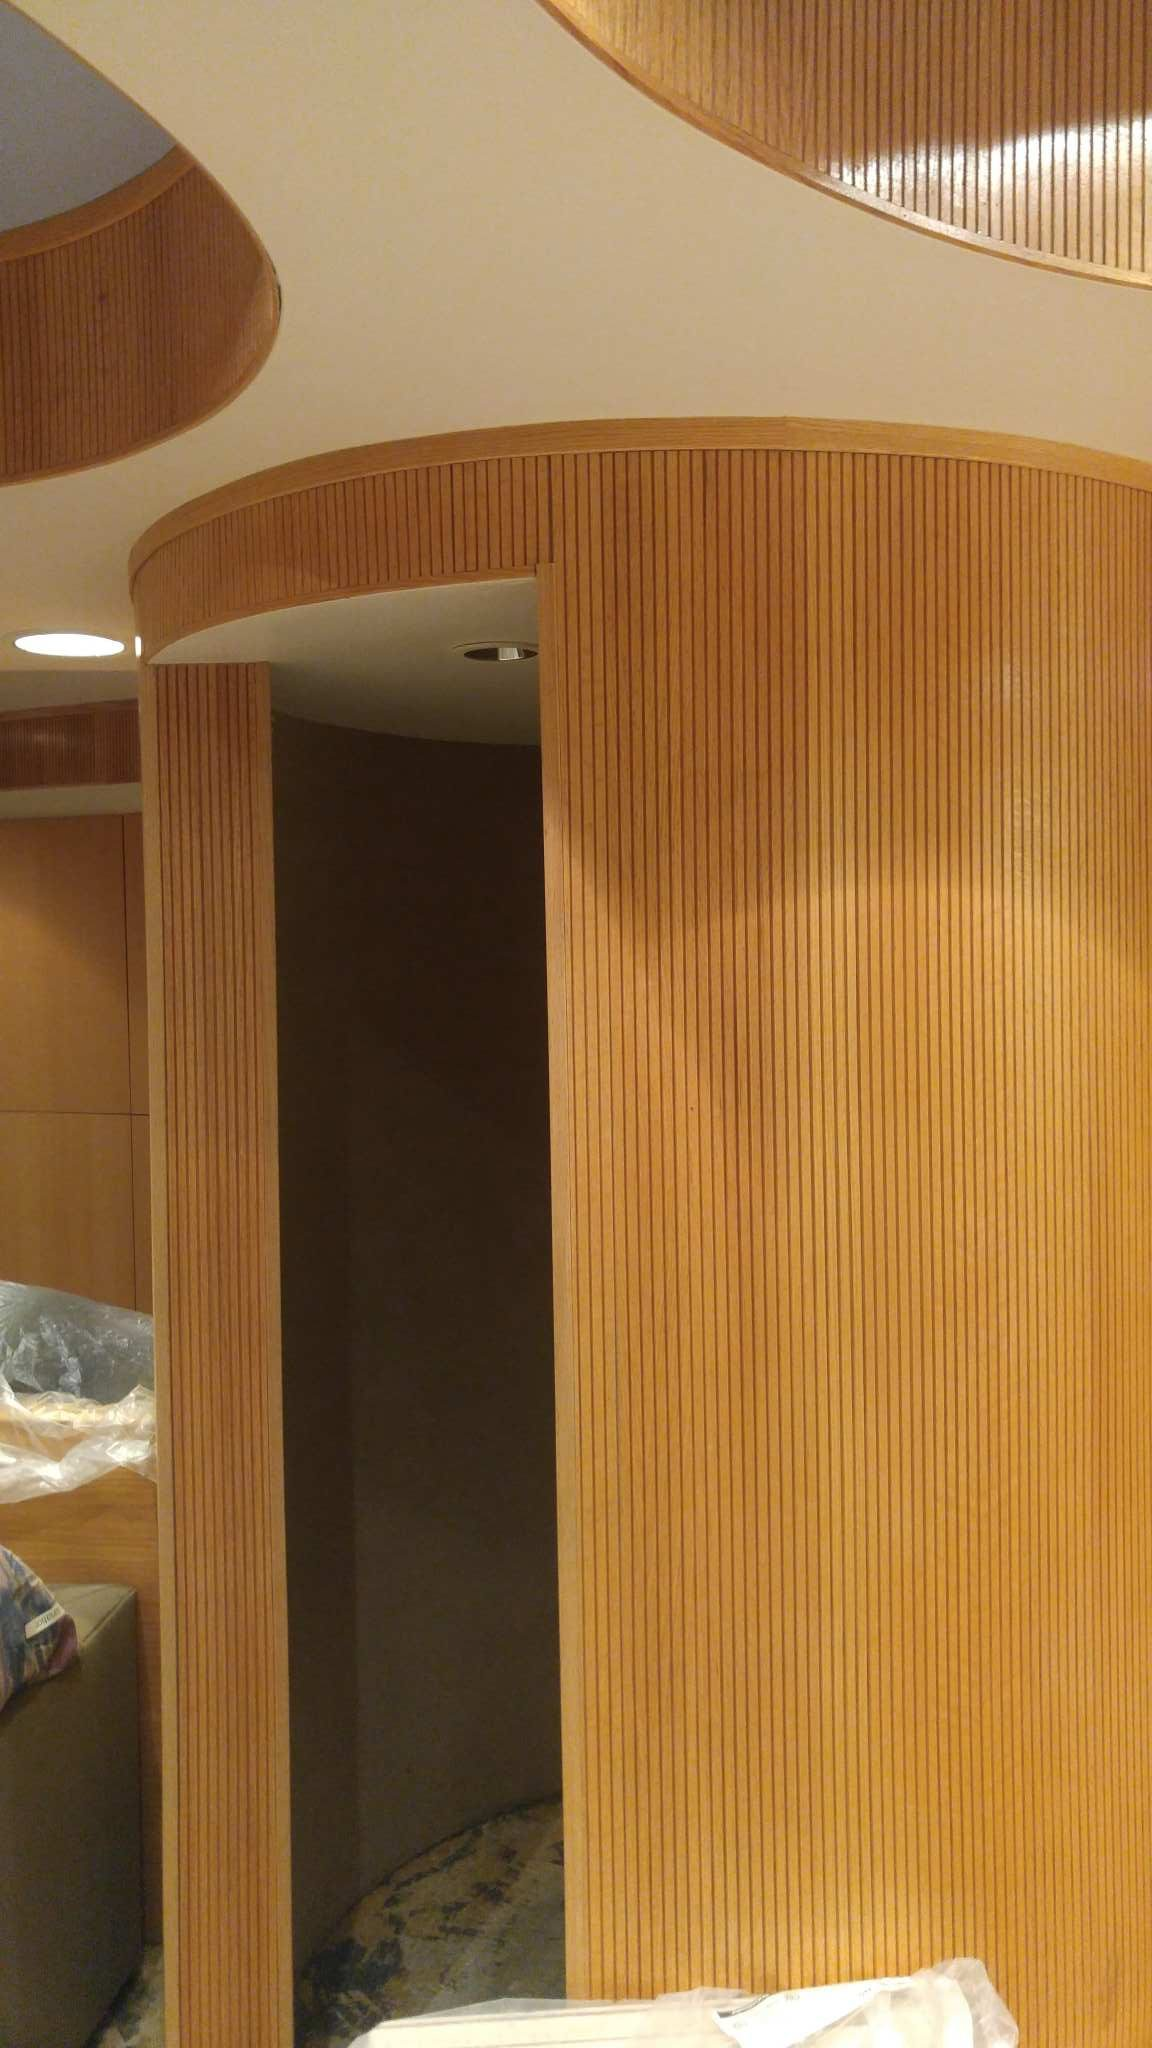 Tambour Panels Solid Wood And Veneers Surfacing Solution